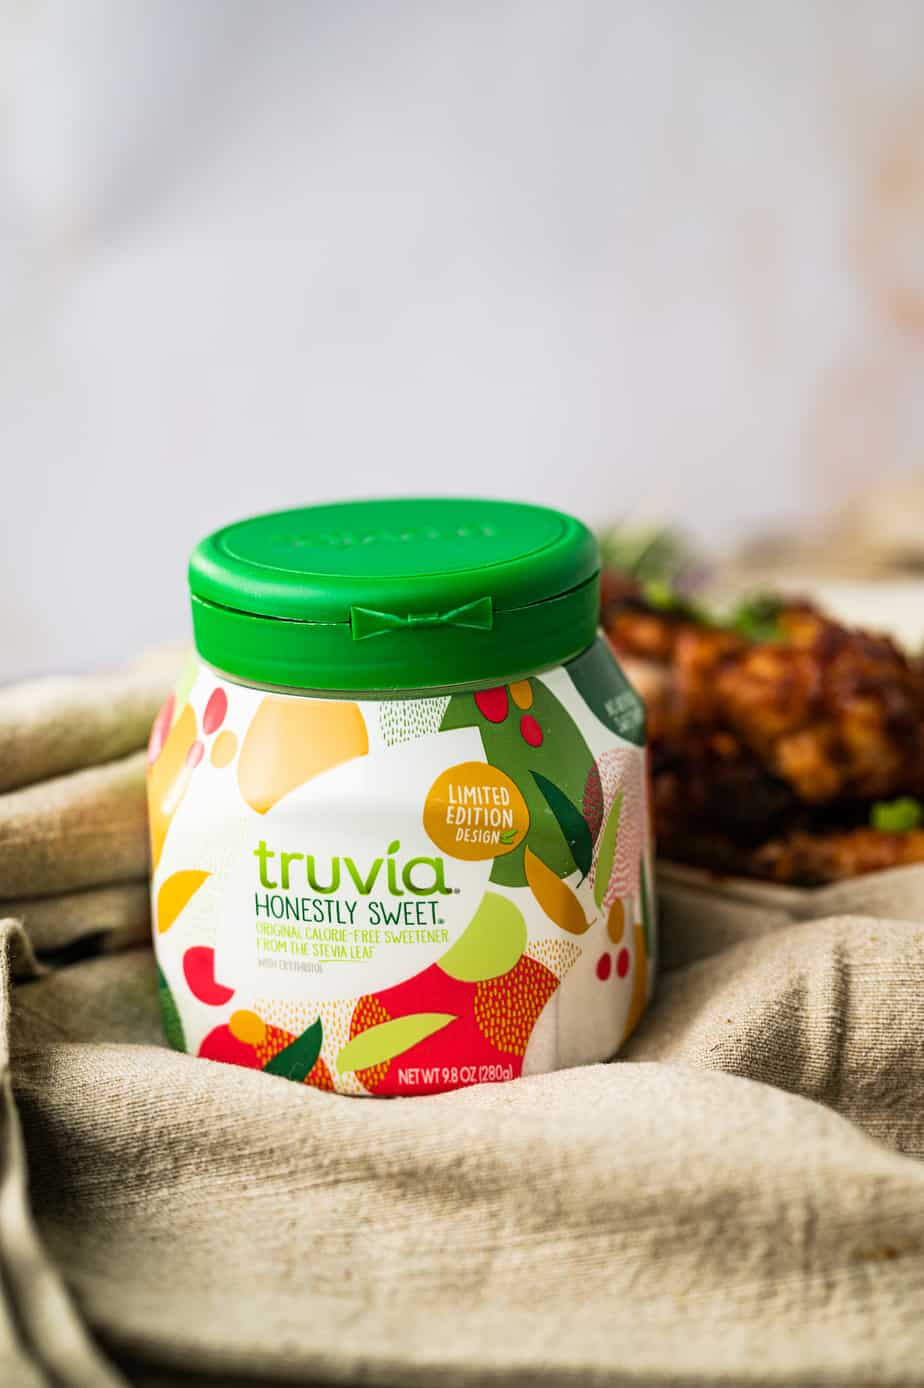 Truvia original sweetener in limited edition bottle